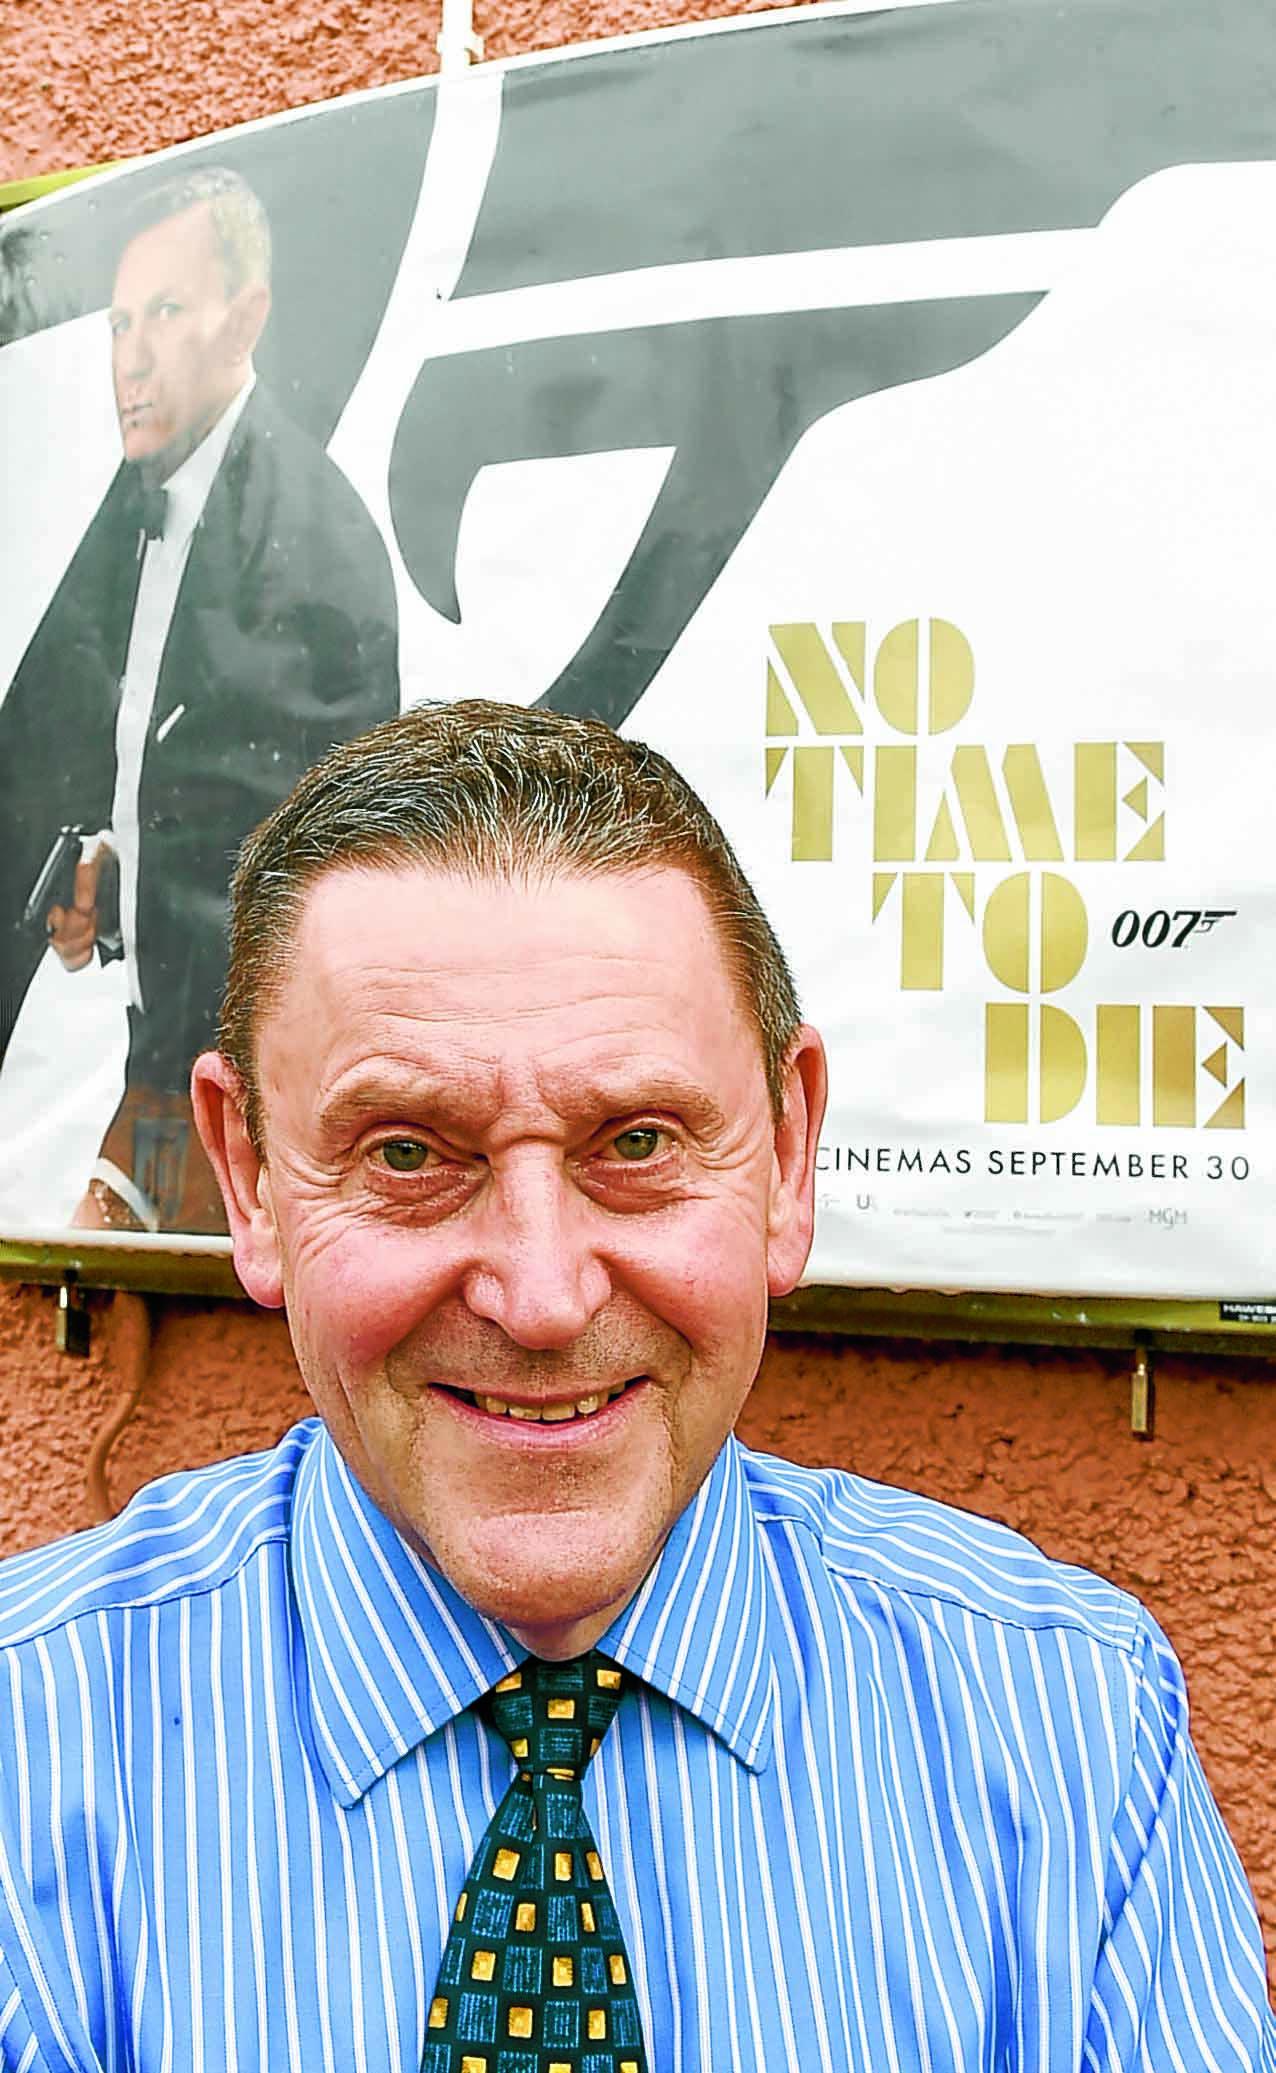 Bond brings back moviegoers